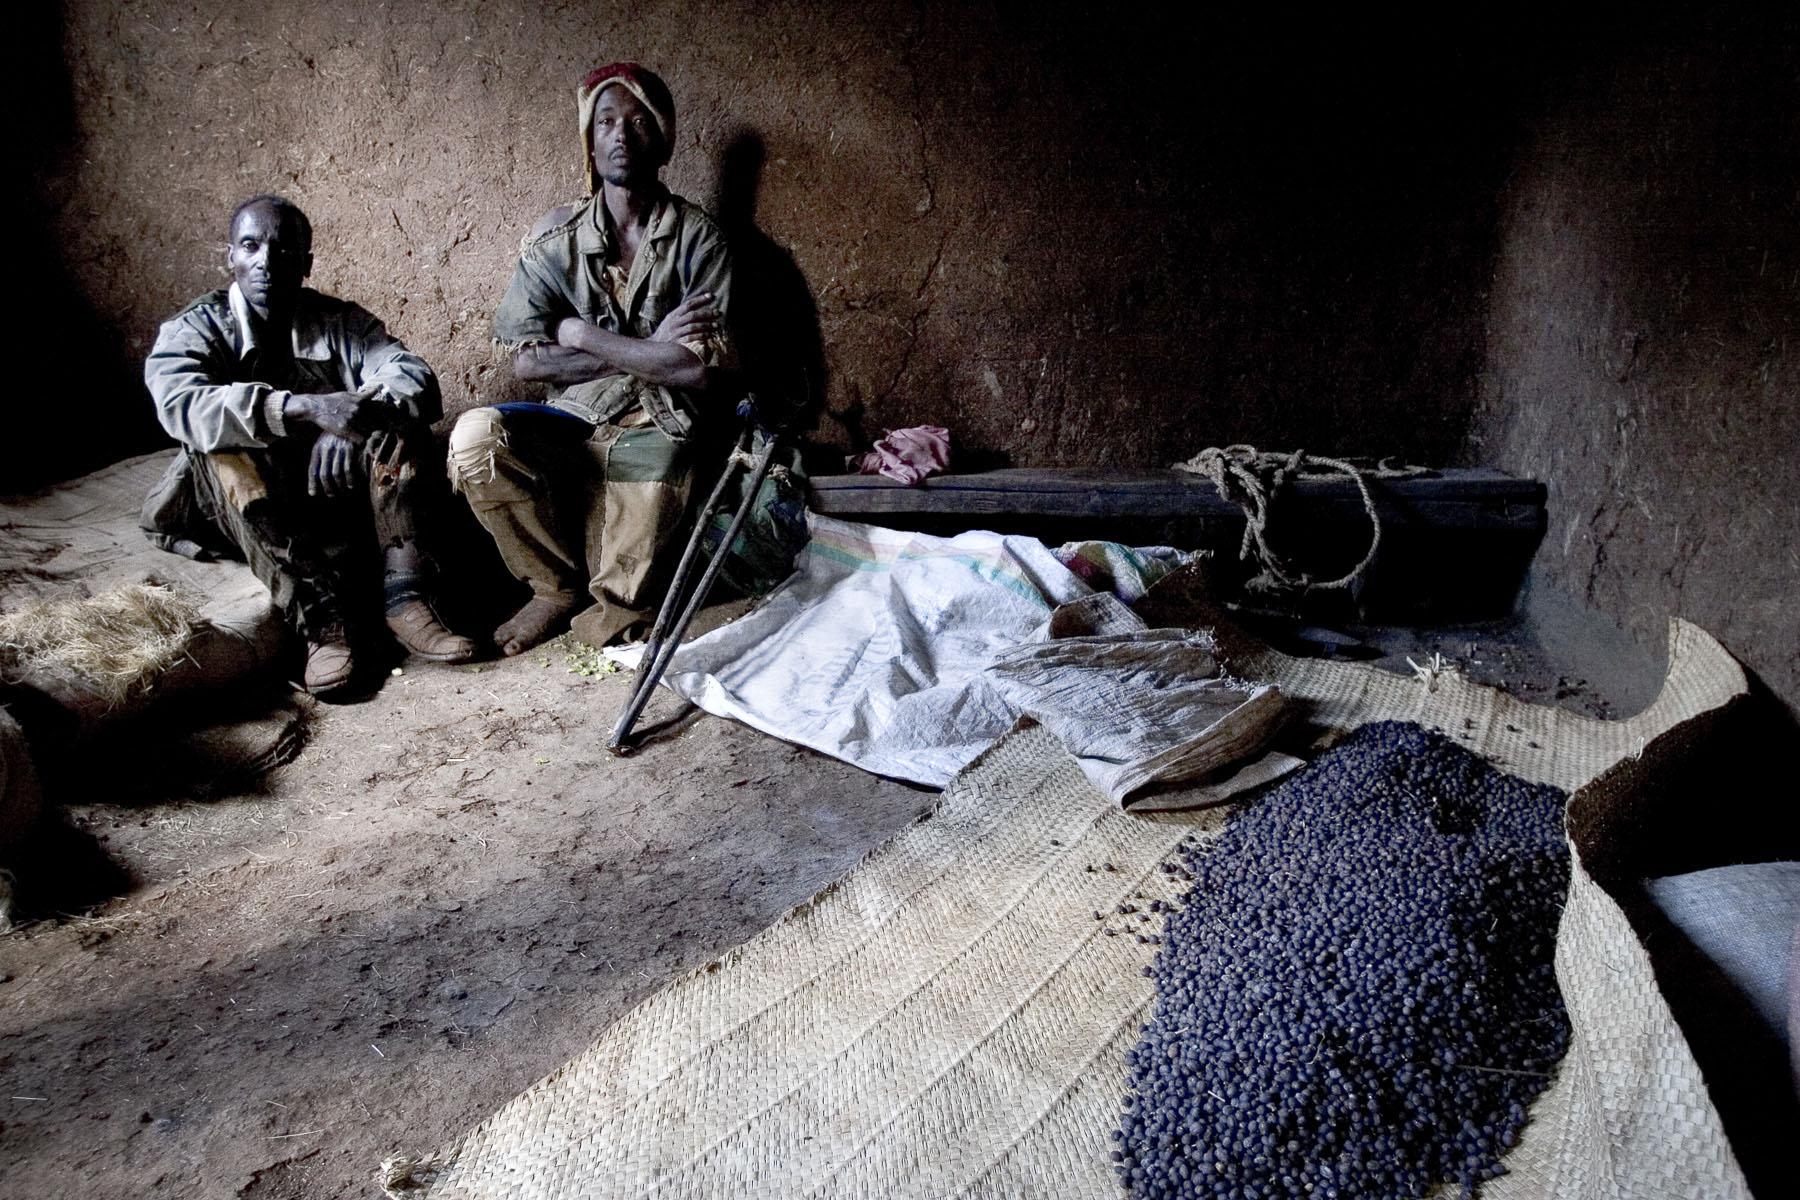 Mankra, the homeland of coffee. Men harvesting wild coffee in November 2004